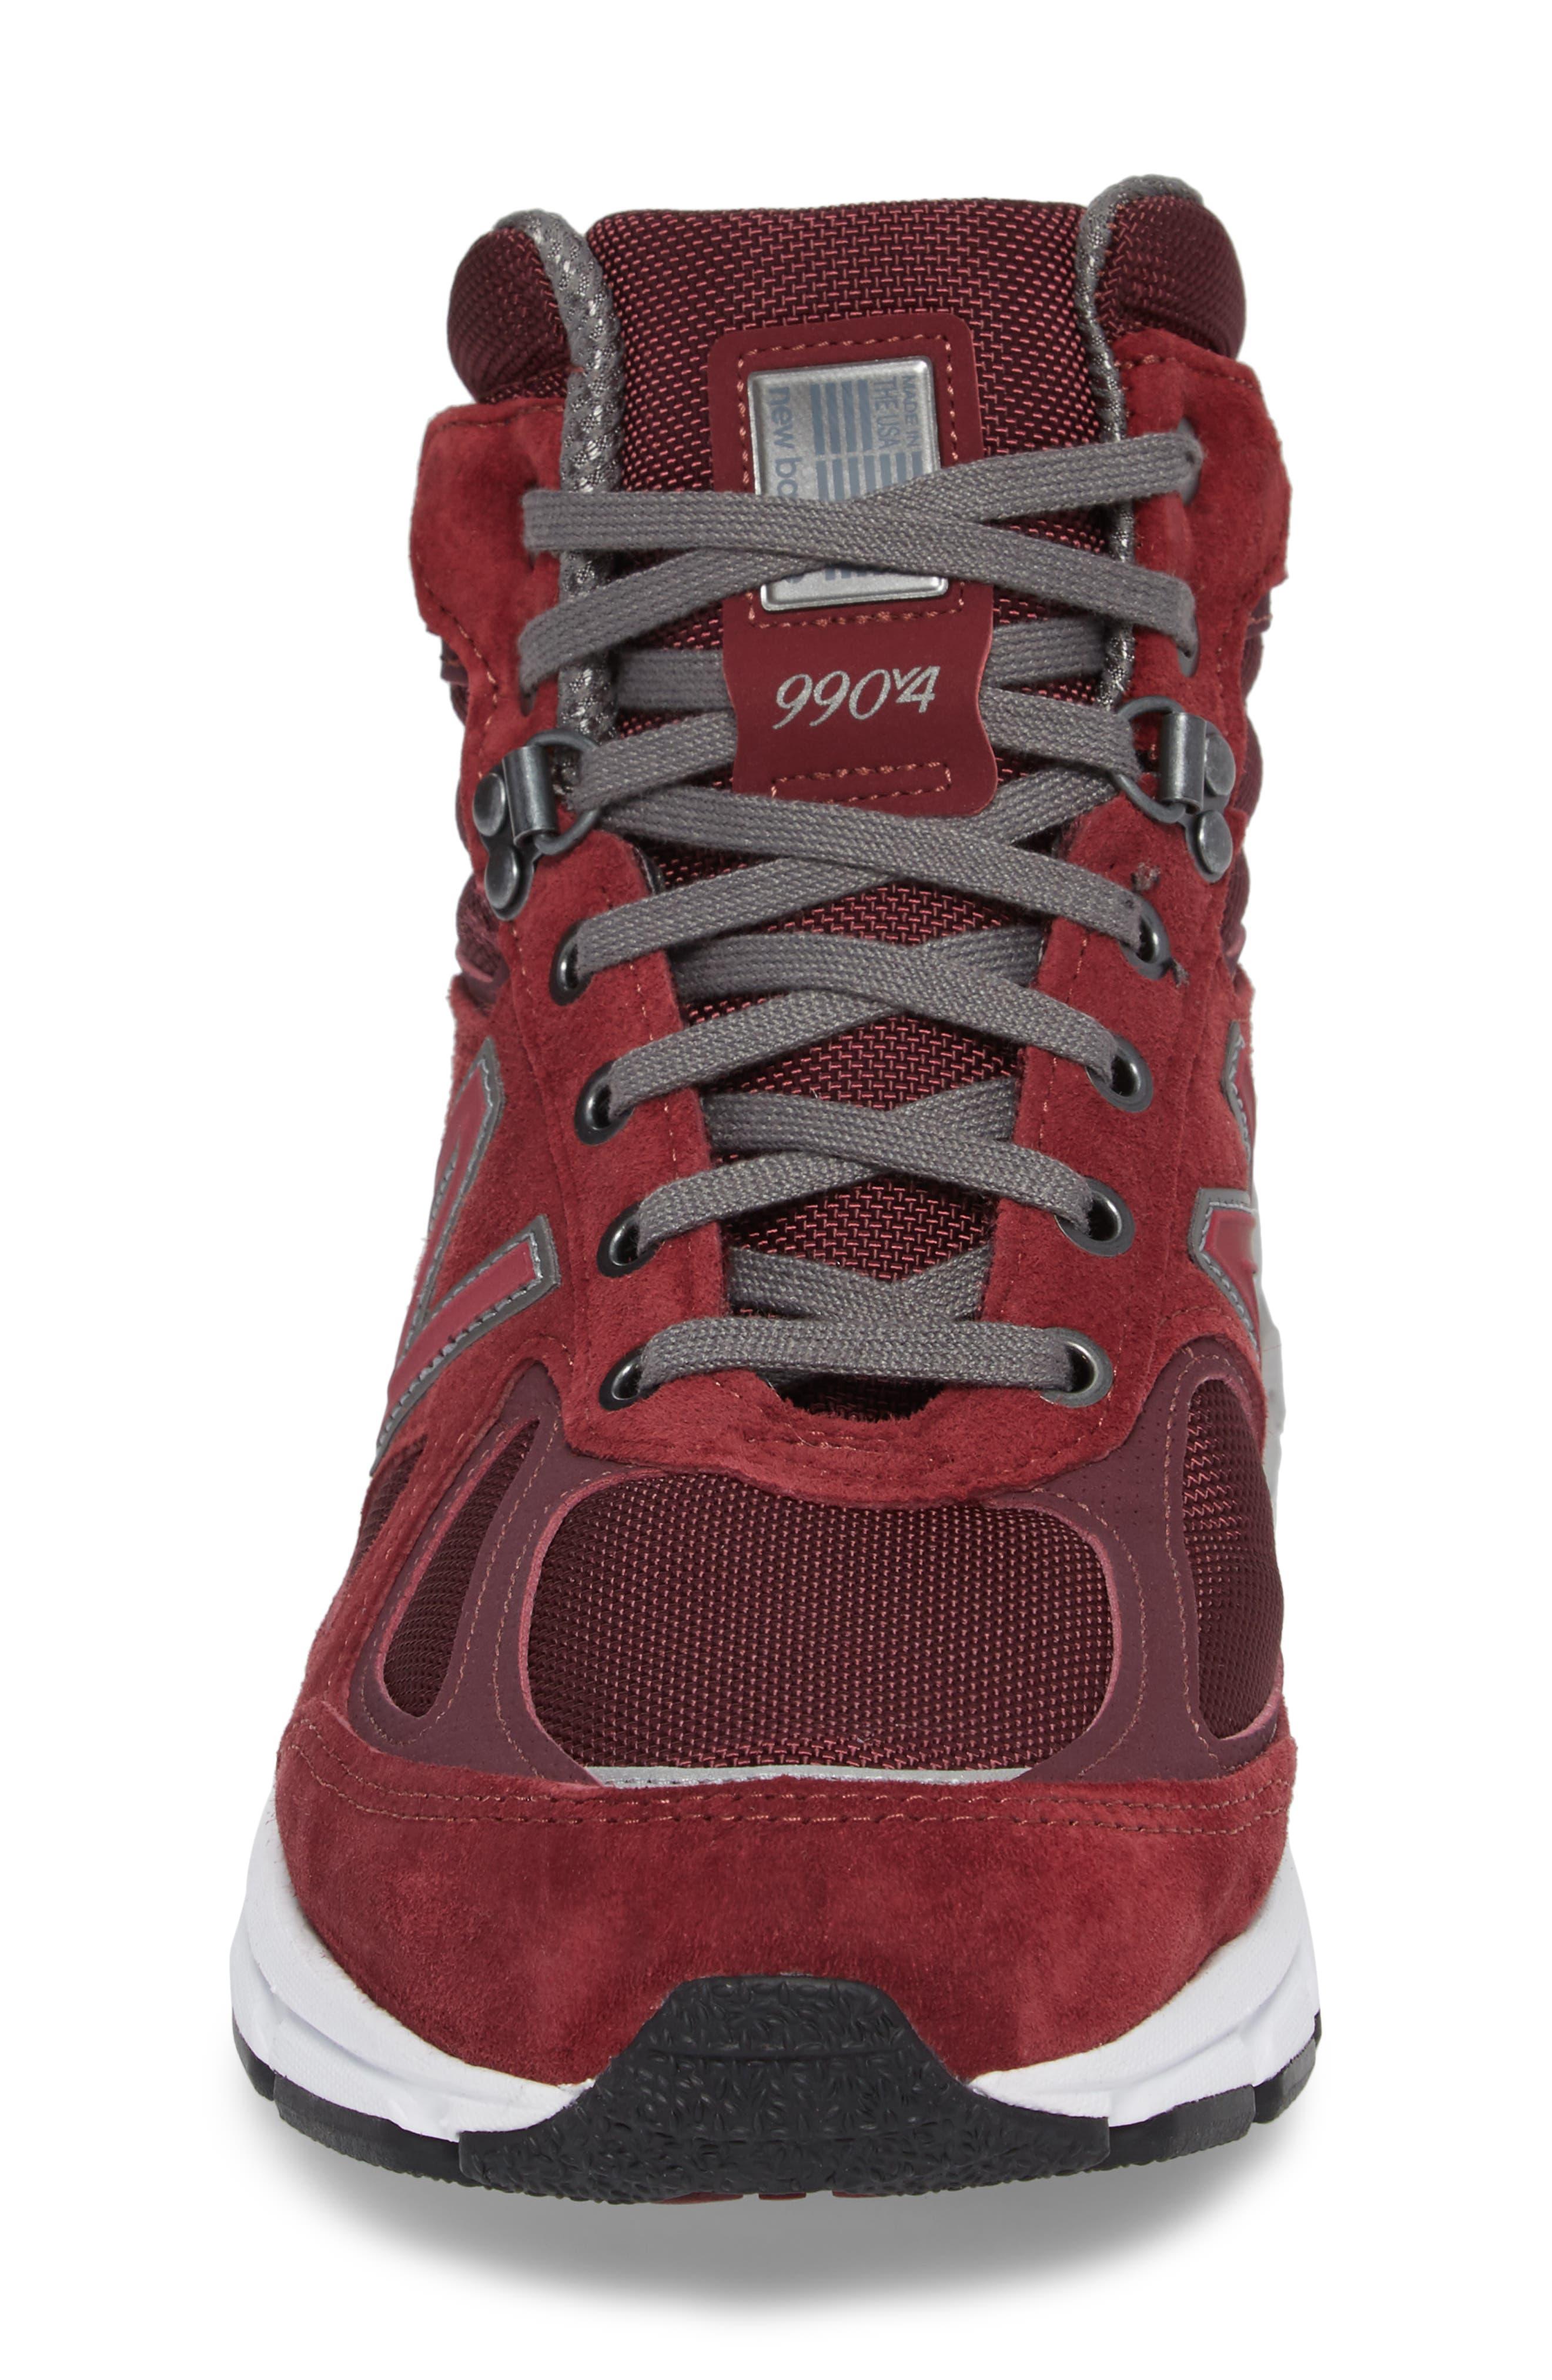 990v4 Water Resistant Sneaker Boot,                             Alternate thumbnail 4, color,                             932